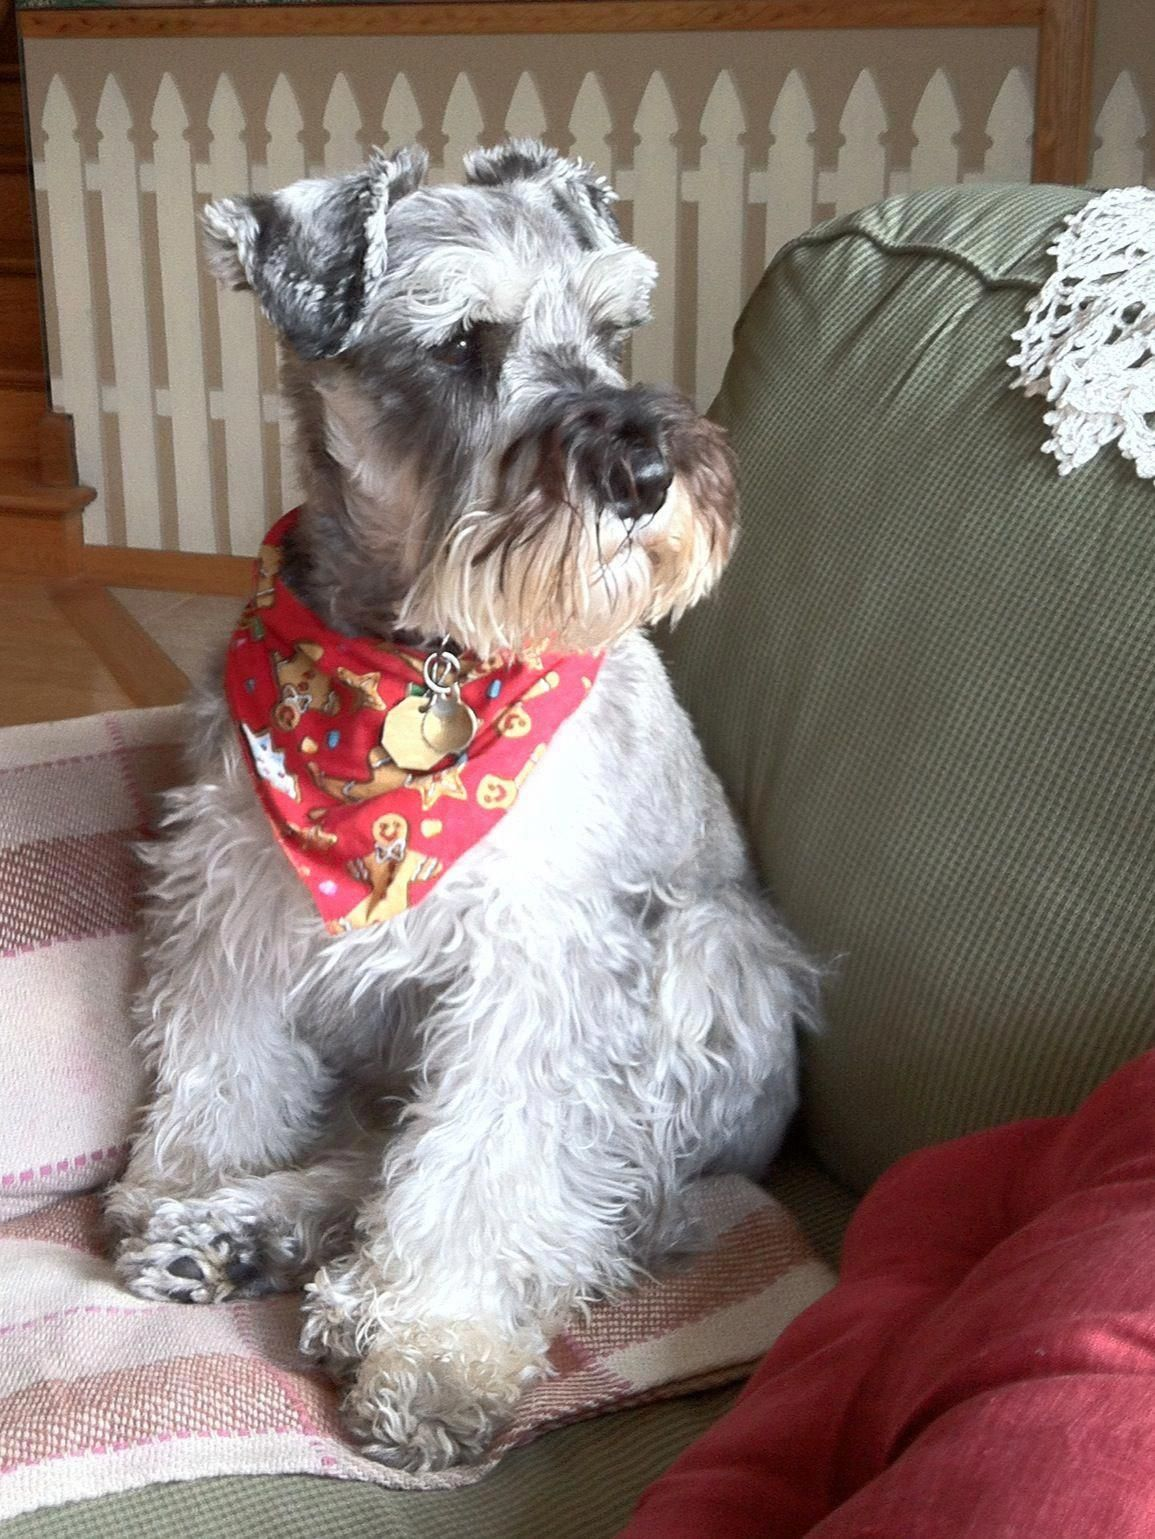 #minischnauzer #schnauzer #dog #schnauzerdogs #miniatureschnauzer